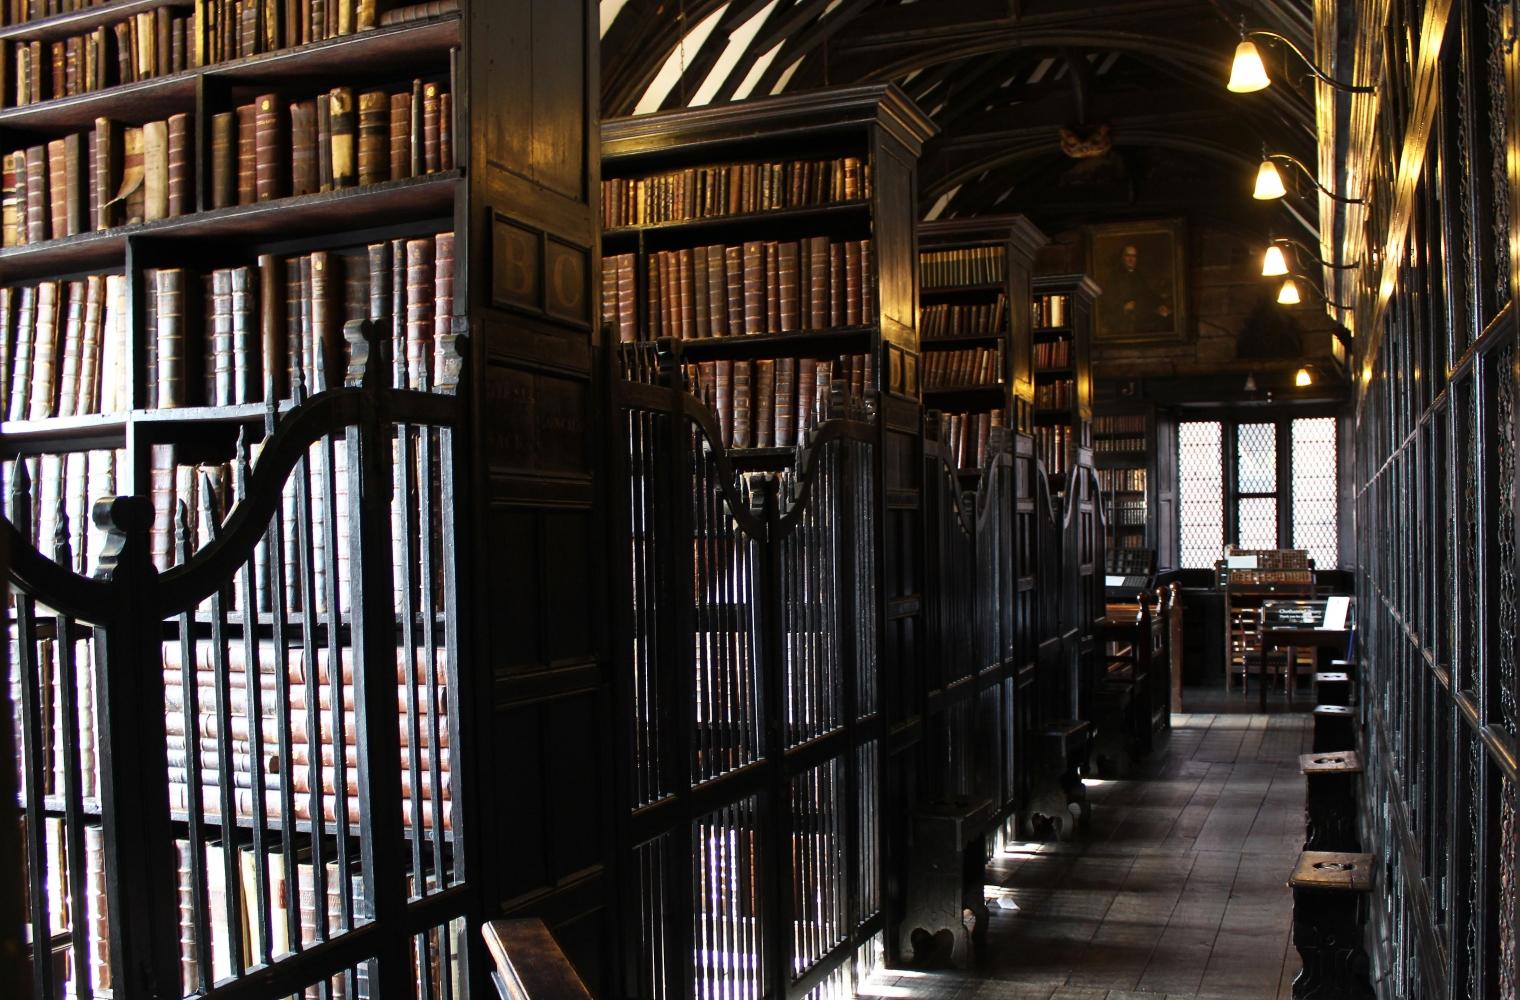 Chethams Library